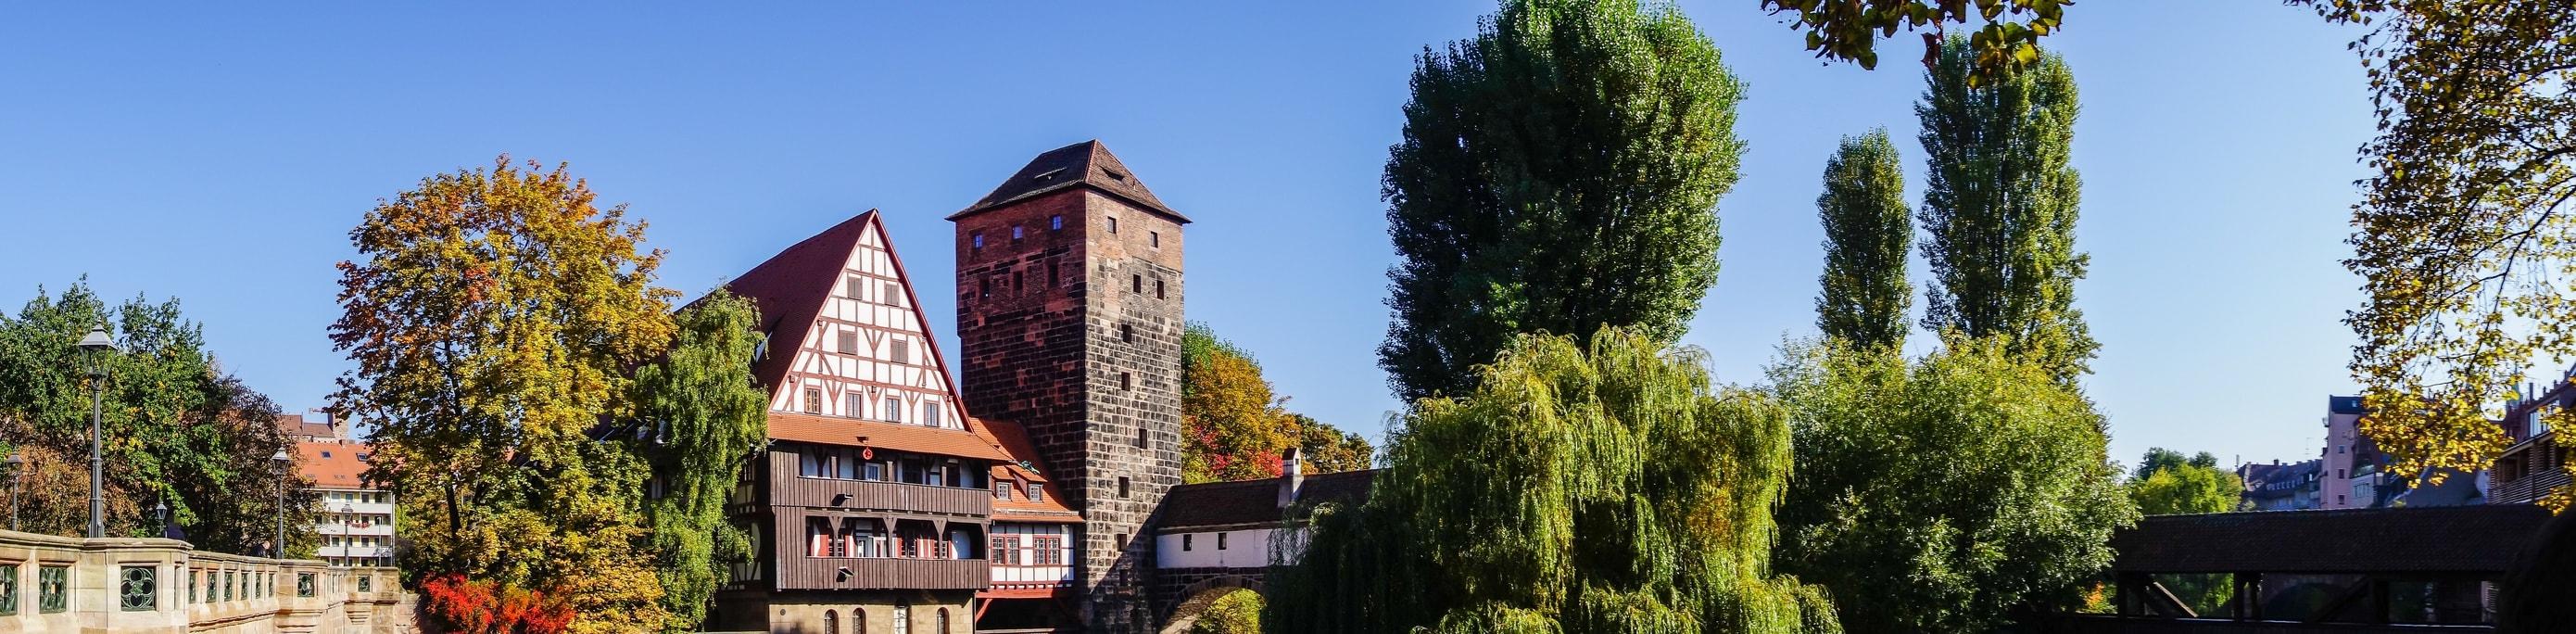 Panorama Maxbrücke und Weinstadel, Nürnberg